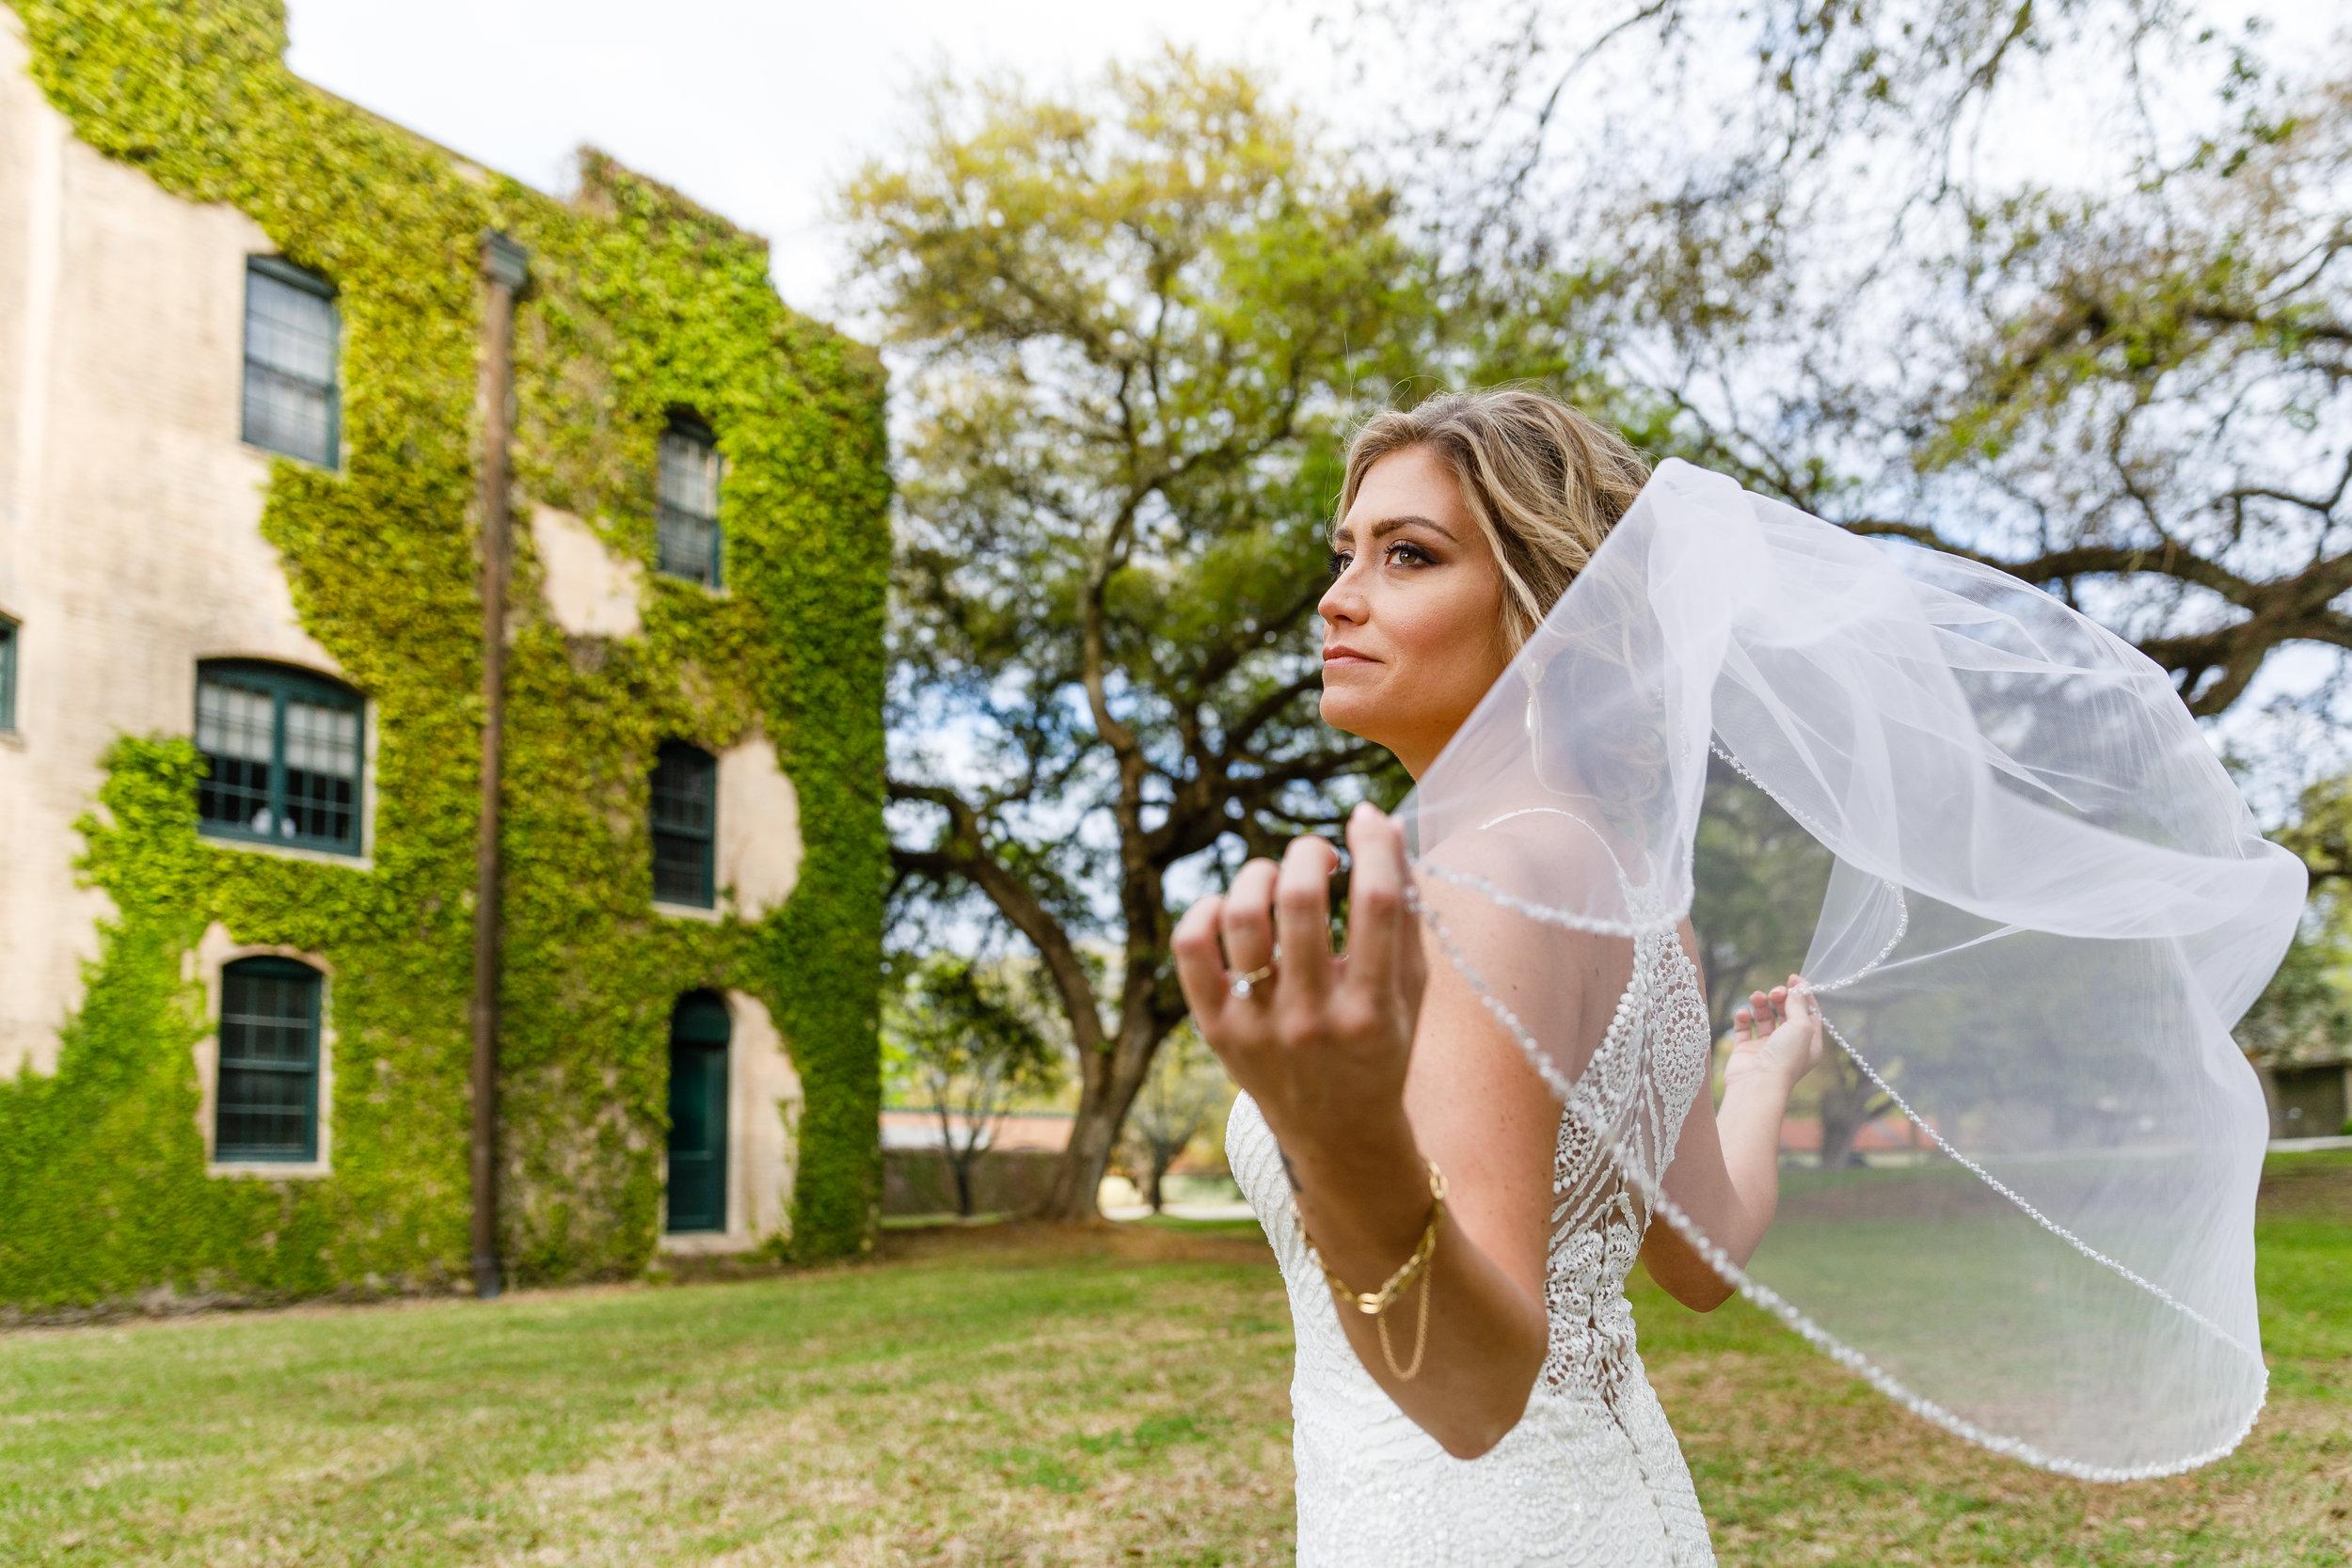 Youngsville-lafayette-portrait-family-wedding-photographer-2982.jpg